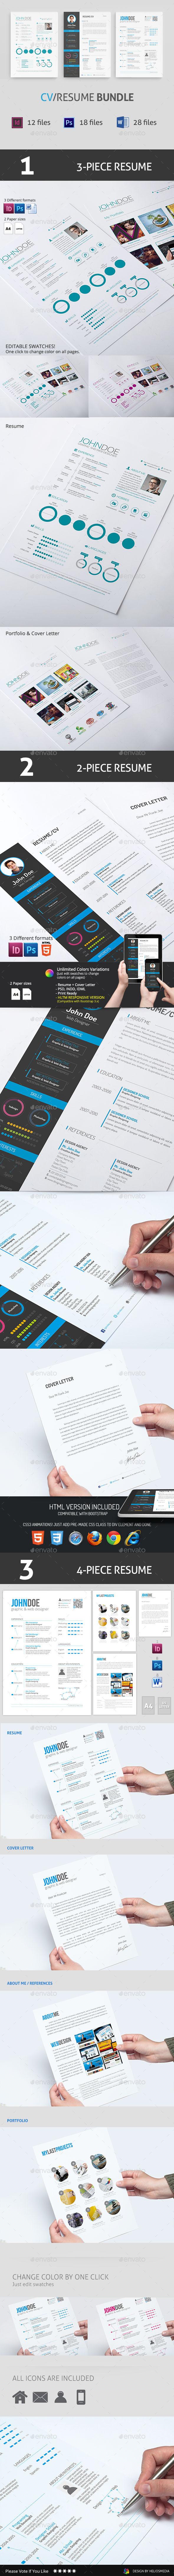 CV / Resume Bundle